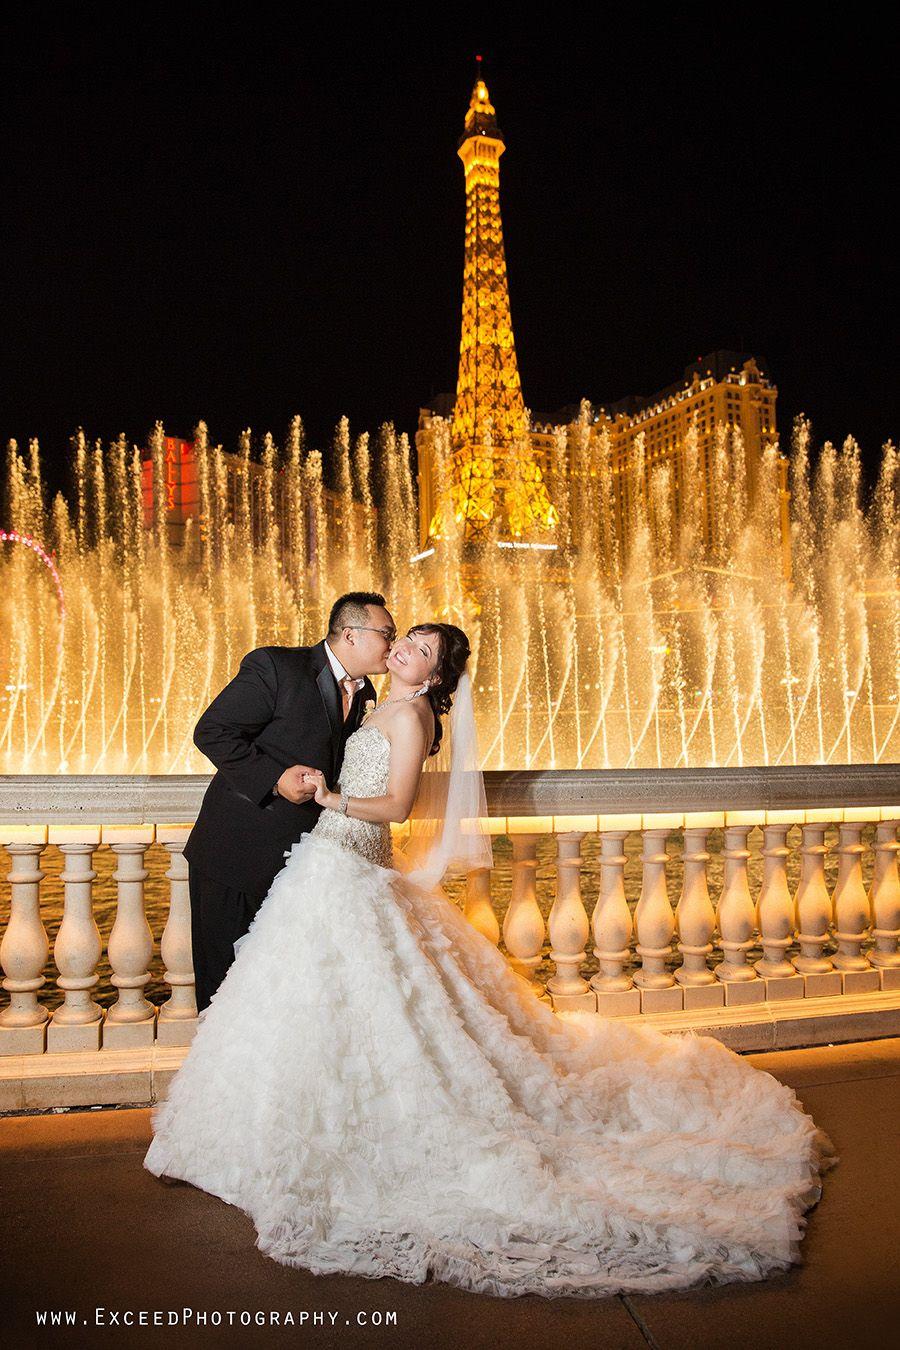 Lazzat Chris Hard Rock Cafe Las Vegas Wedding Las Vegas Wedding Photos Vegas Wedding Photos Las Vegas Wedding Photographers